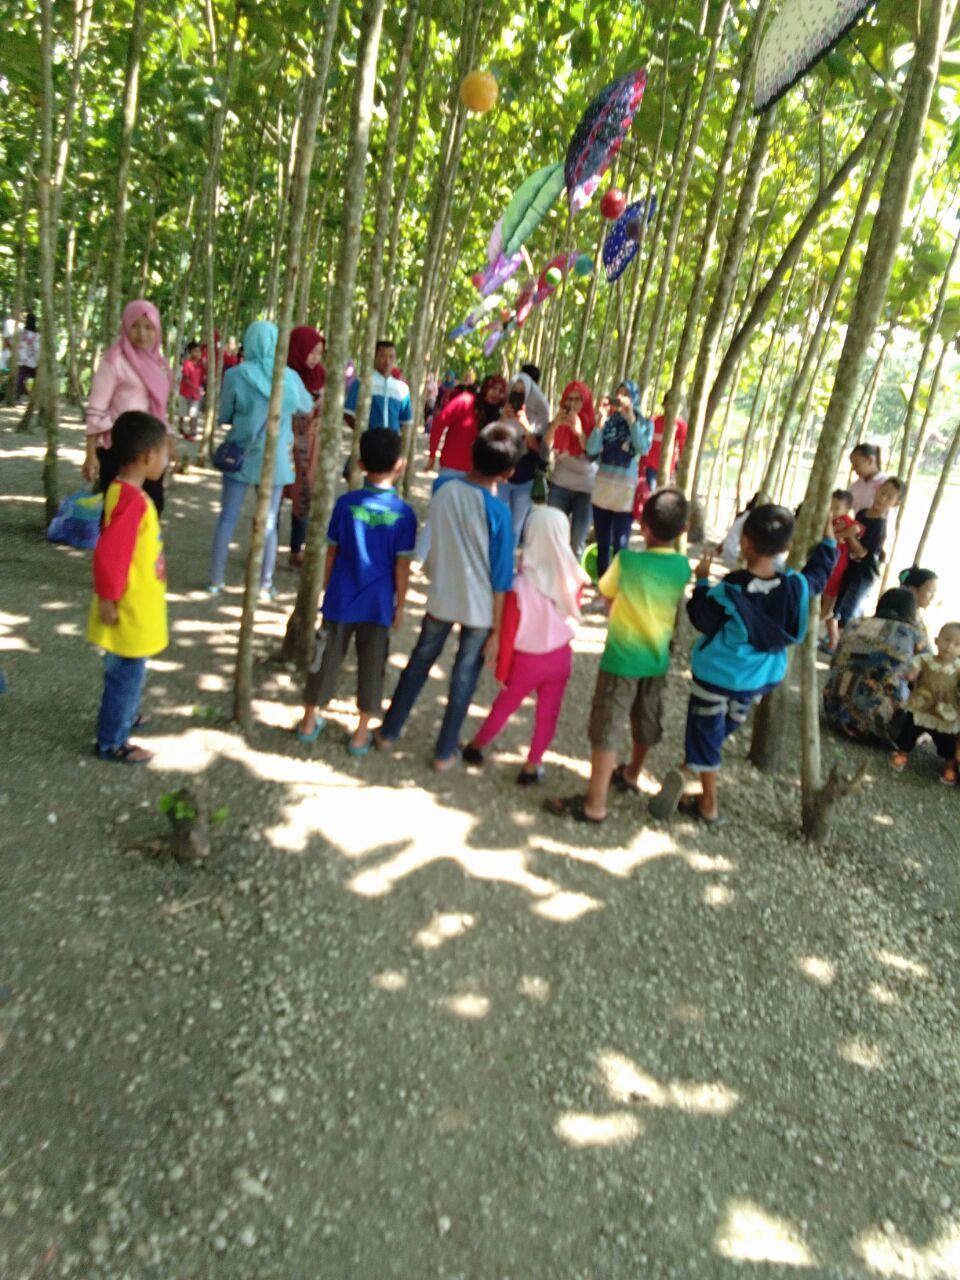 Wisata Waduk Grobokan Bendo Bojonegoro Bojonegorokini Info Salah Satu Pengunjung